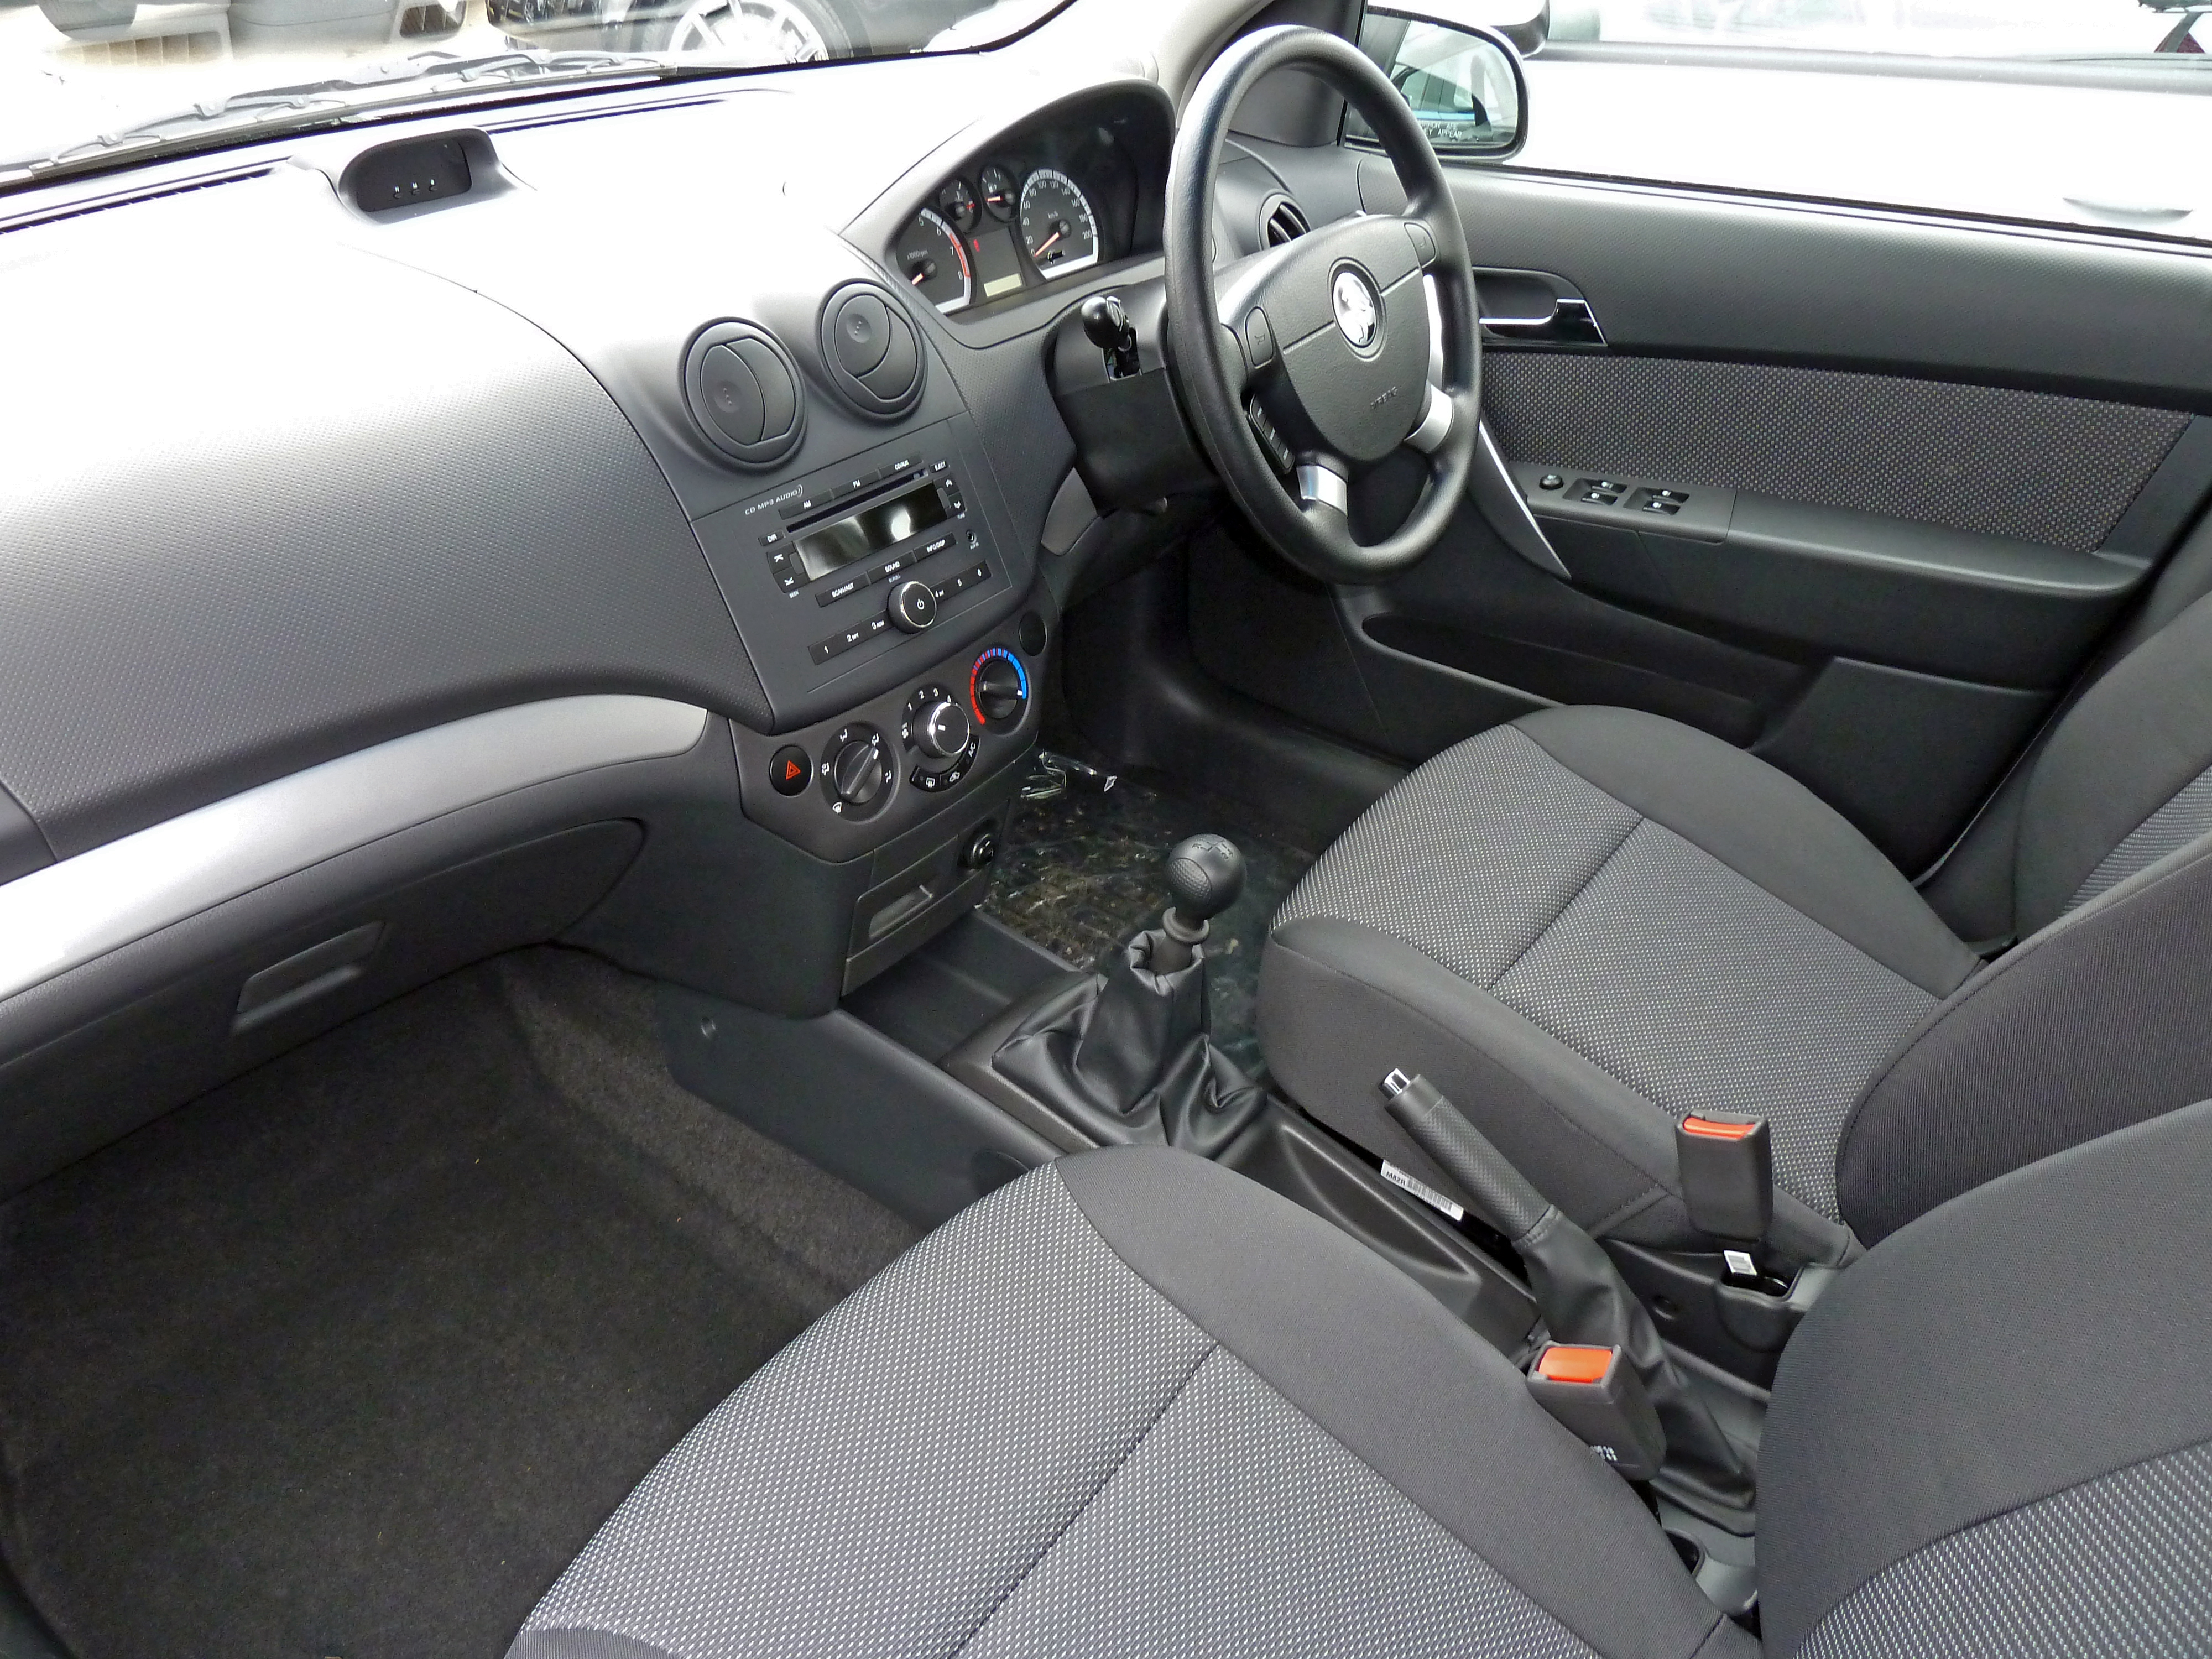 fuse box diagram daewoo matiz daewoo korea wiring diagram ~ odicis Daewoo LeMans Interior  Hyundai Verna Interior Pontiac Matiz Interior Suzuki Jimny Interior